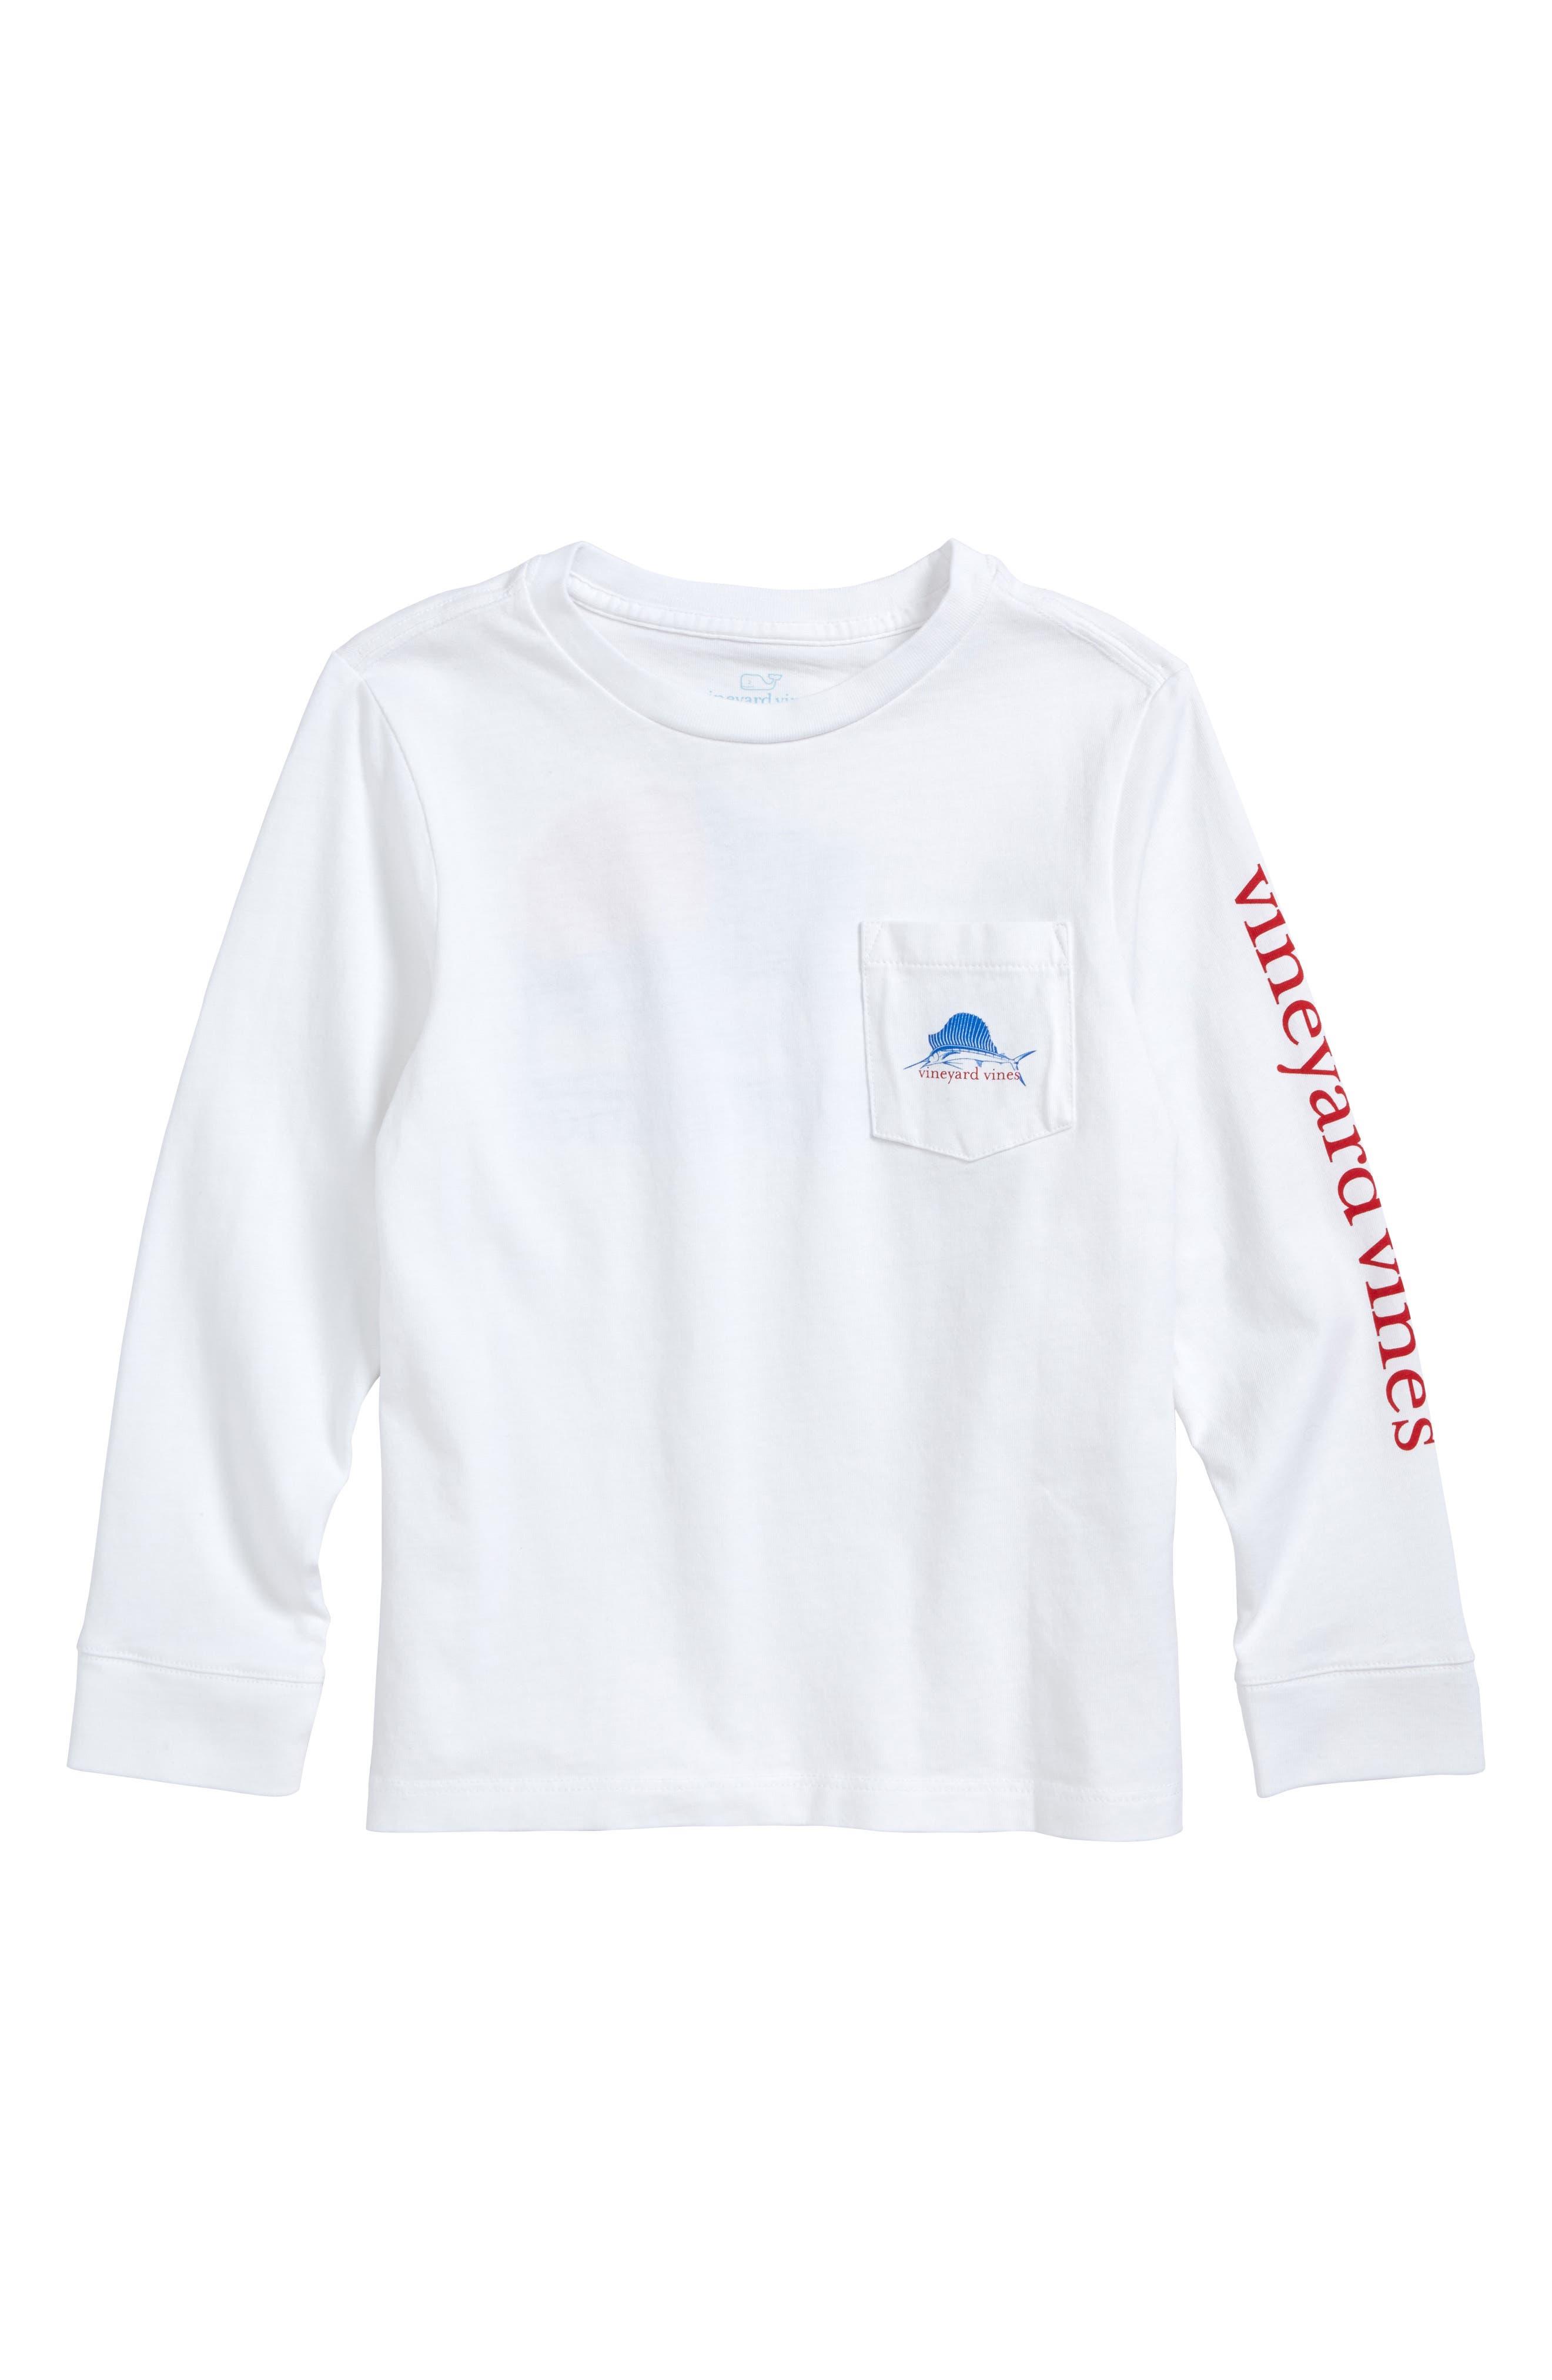 American Sailfish T-Shirt,                         Main,                         color, White Cap